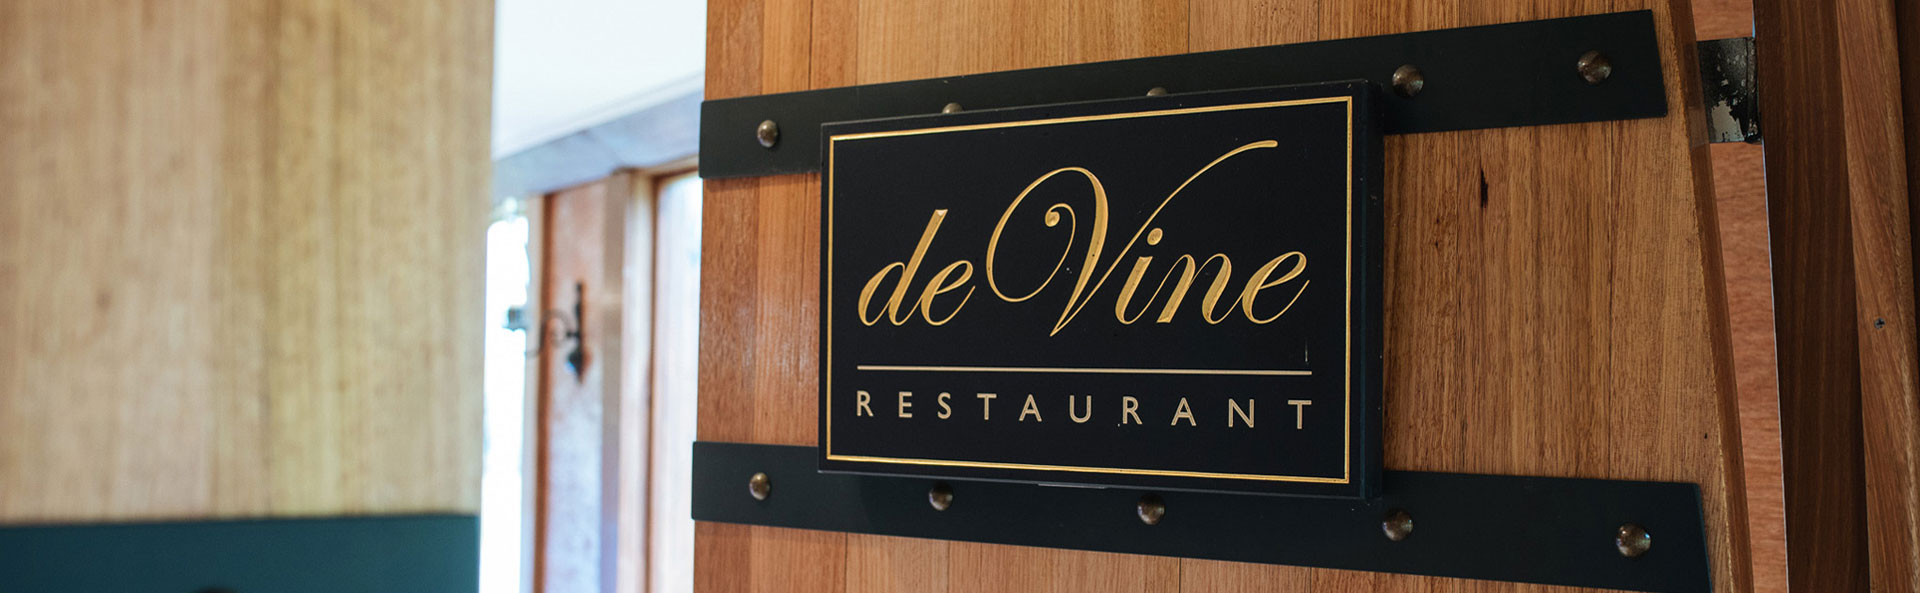 deVine Restaurant